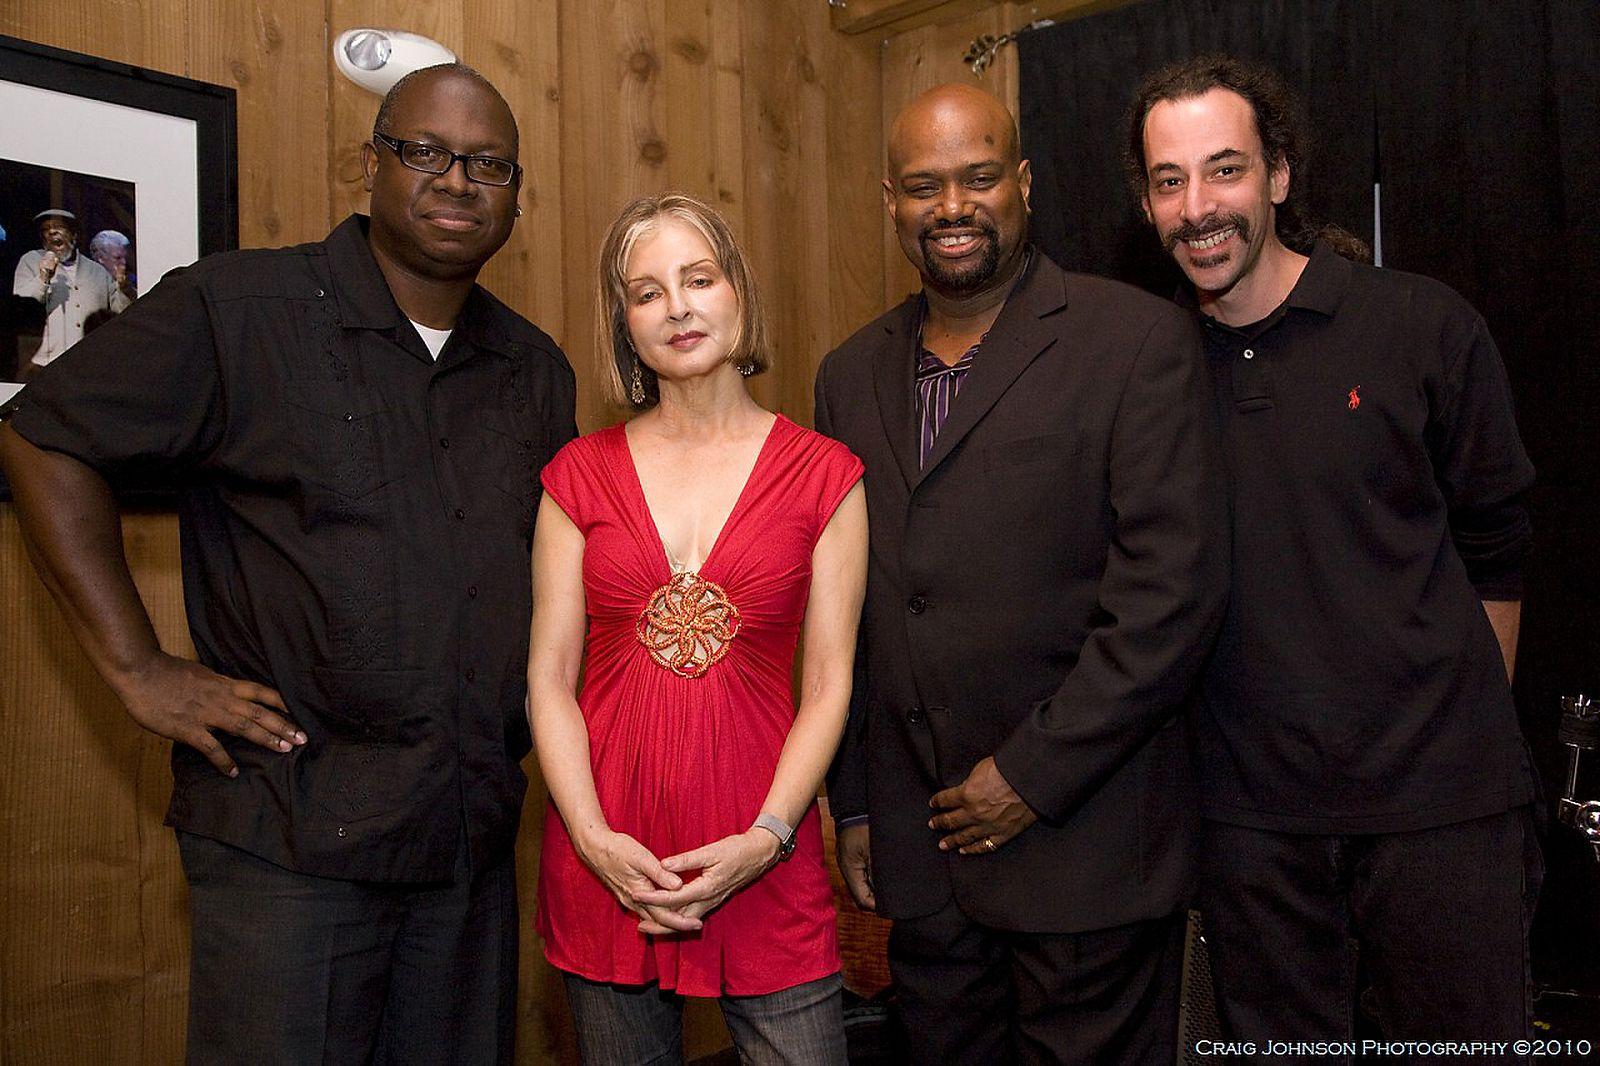 Dfq~dale Fielder Quartet